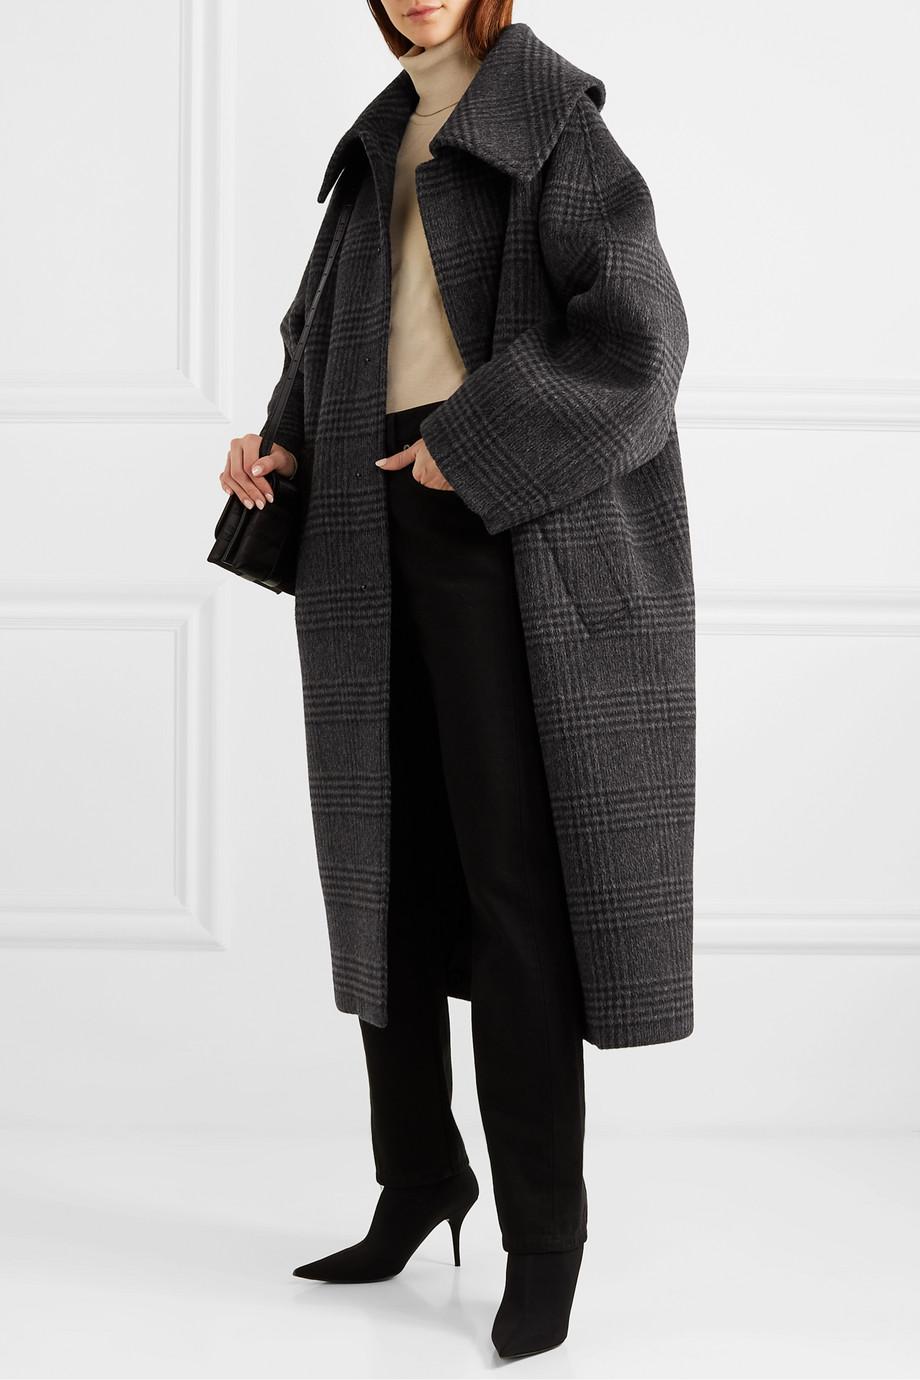 Balenciaga Incognito Prince of Wales checked wool-blend coat